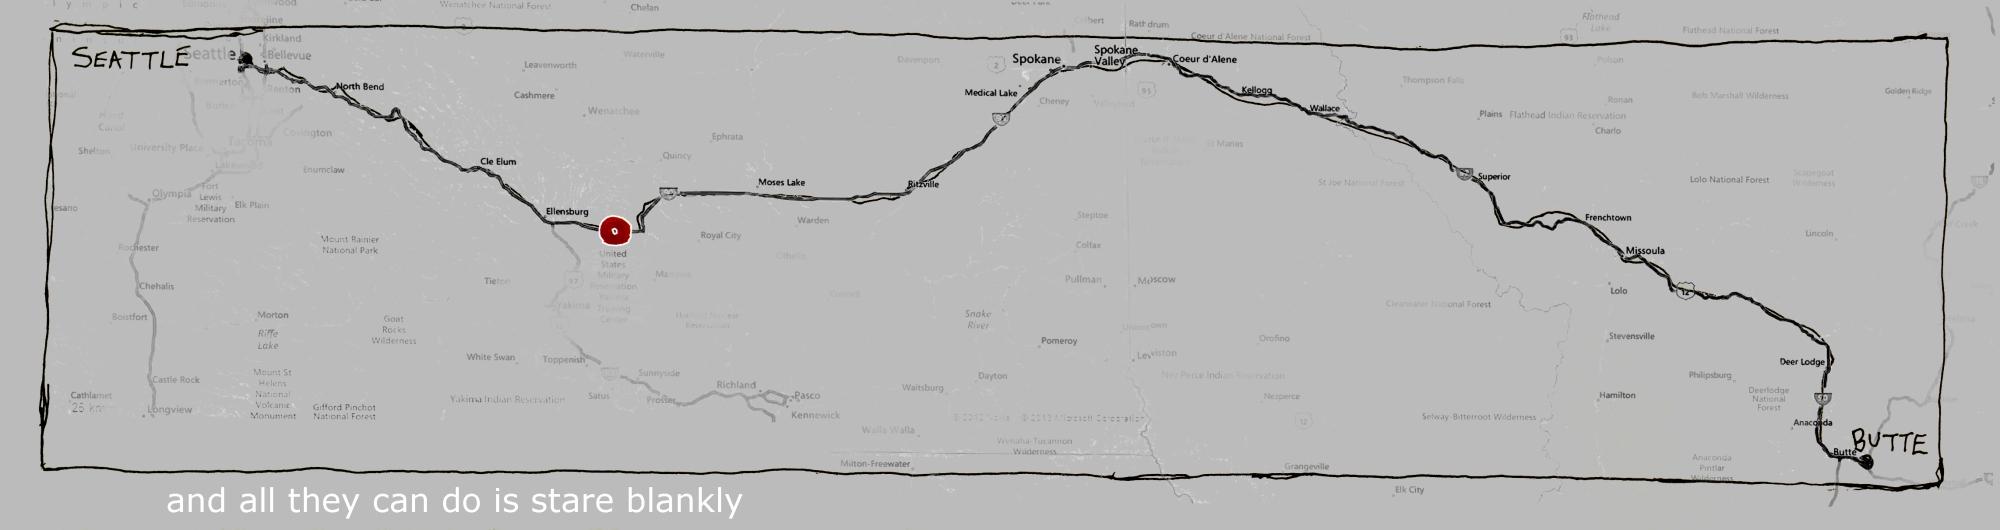 110 map grey